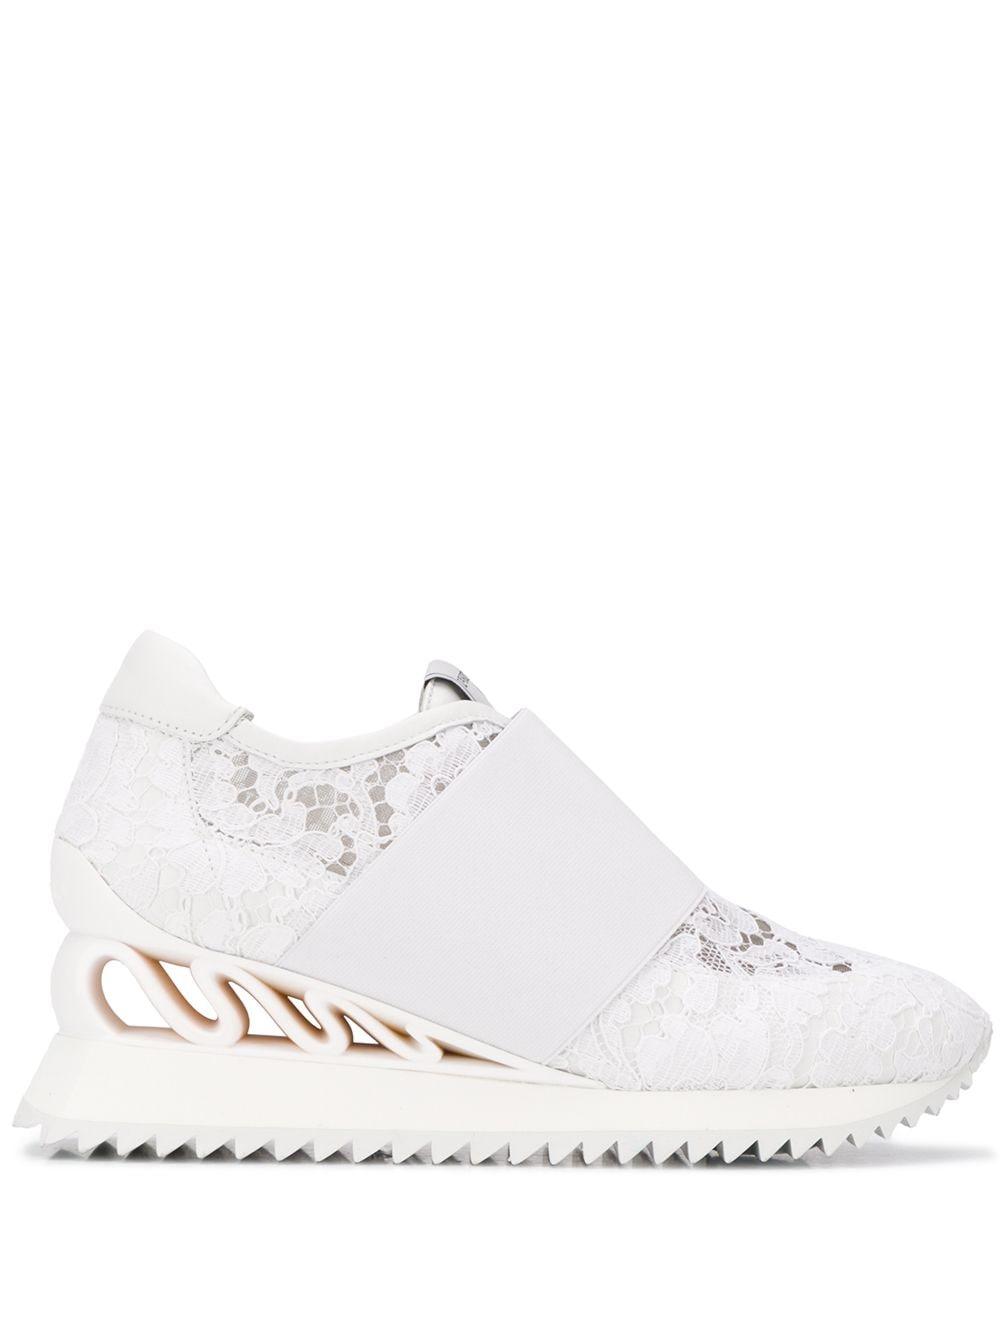 Le Silla 'Rubel Wave' Sneakers - Weiß